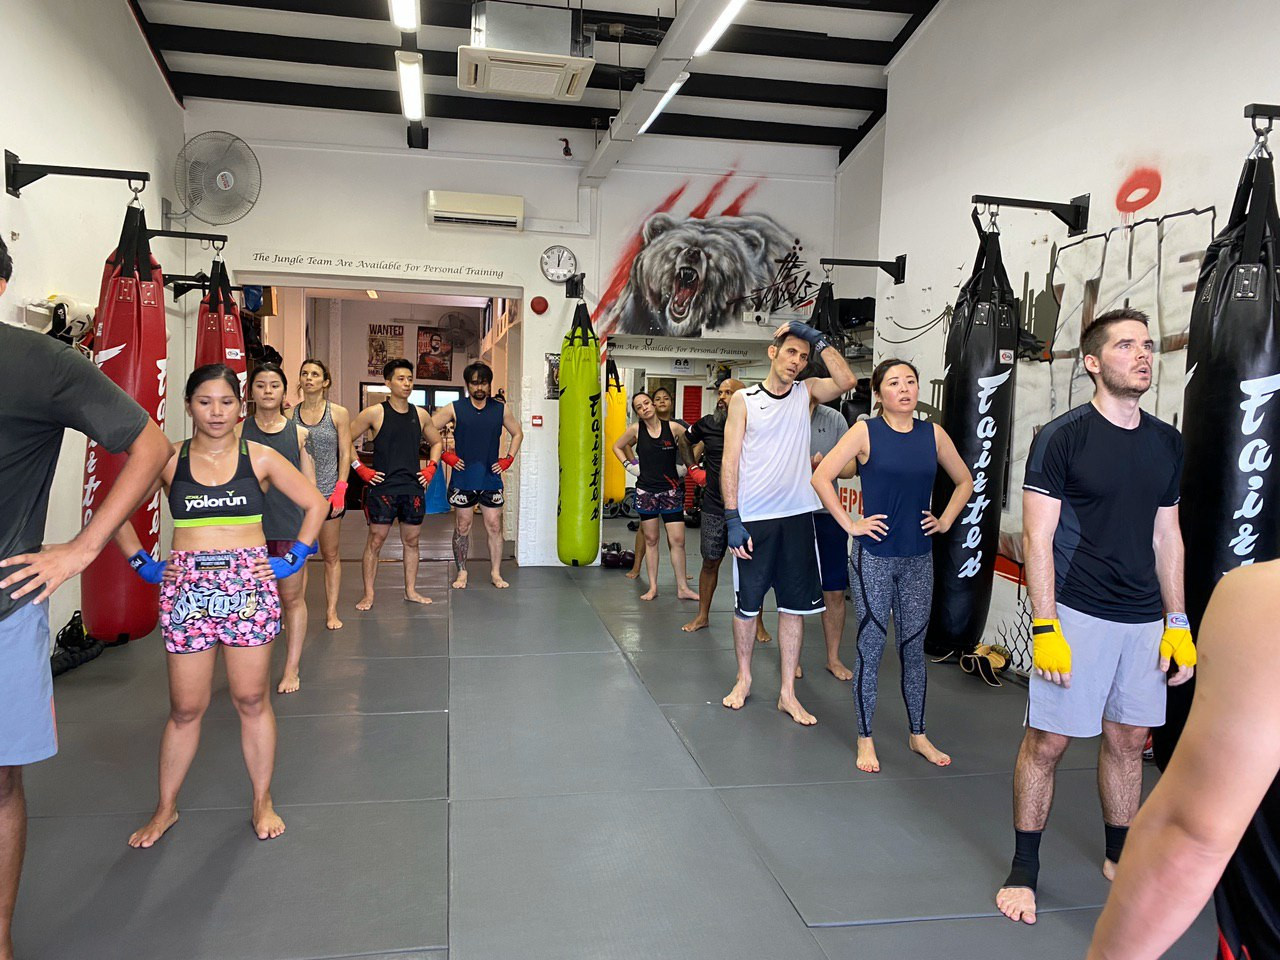 Muay Thai classes at The Jungle